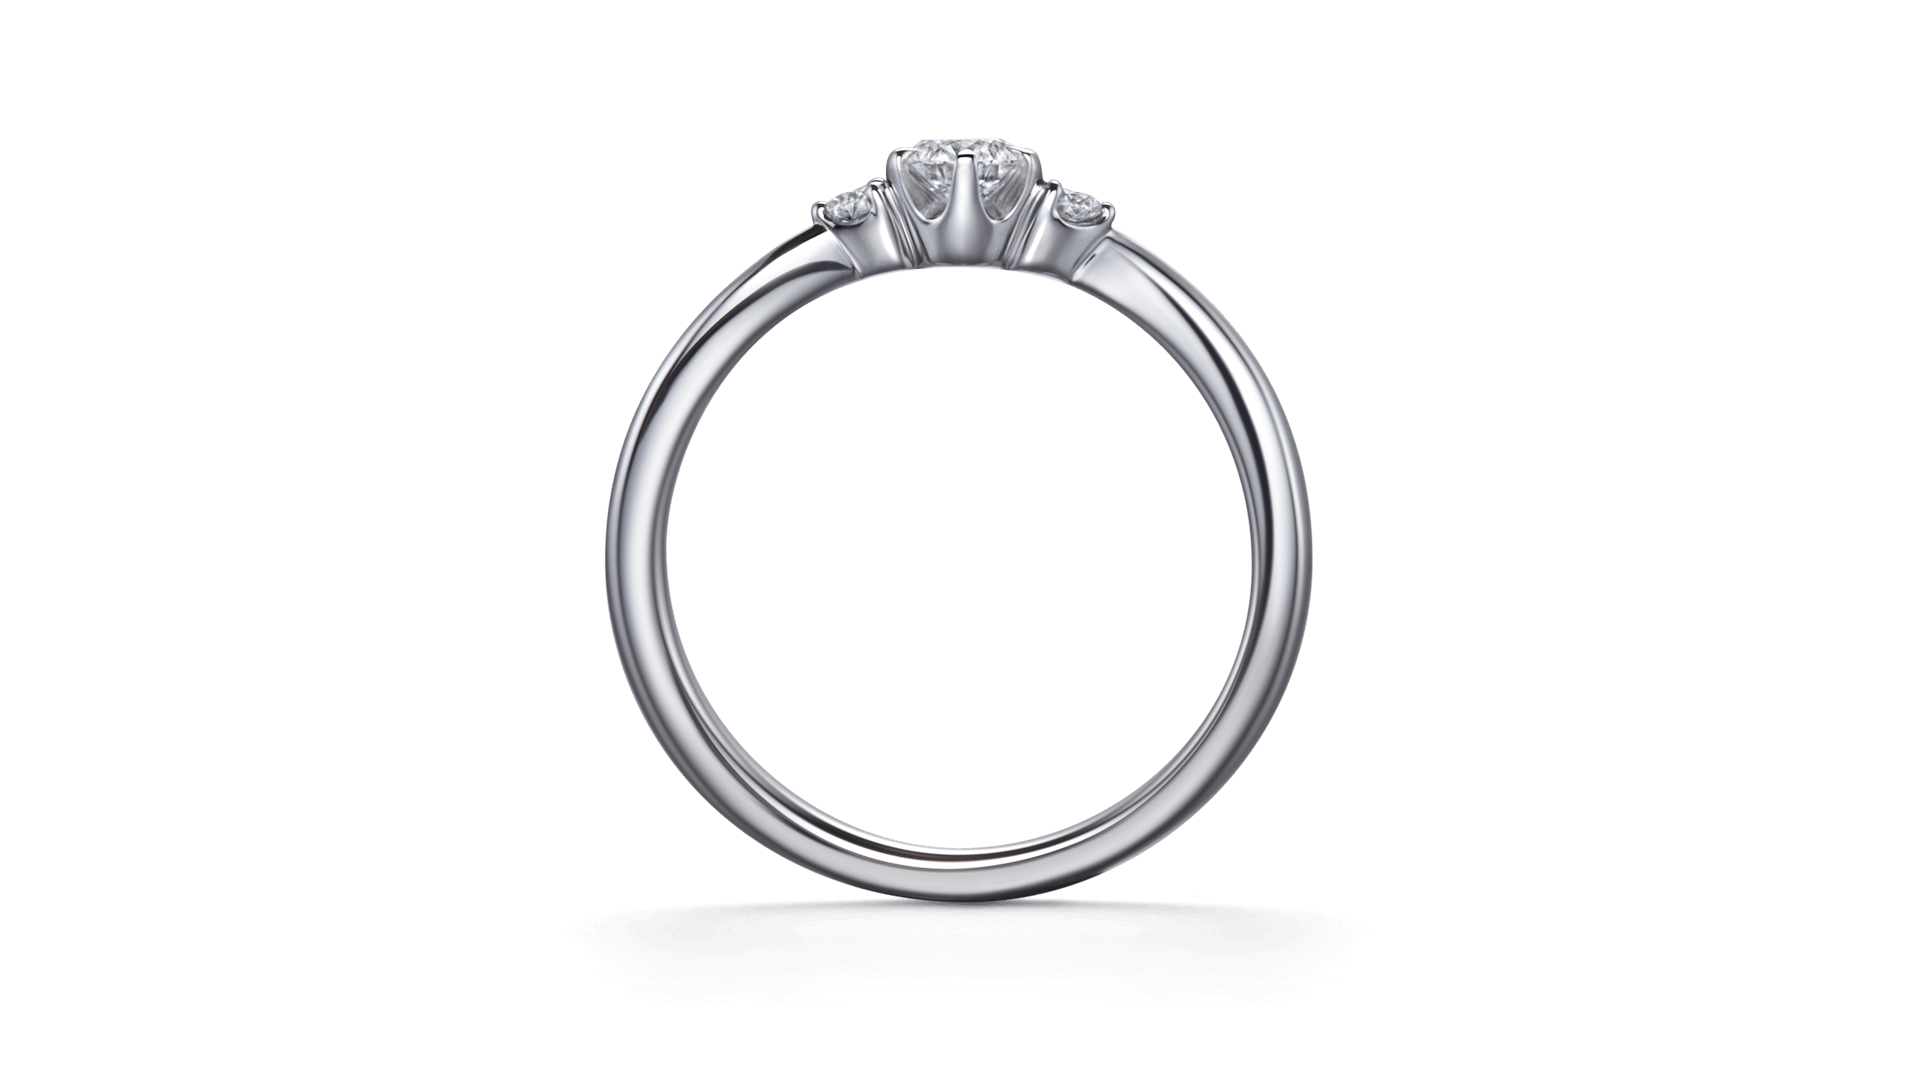 violla ヴィオラ | 婚約指輪サムネイル 2